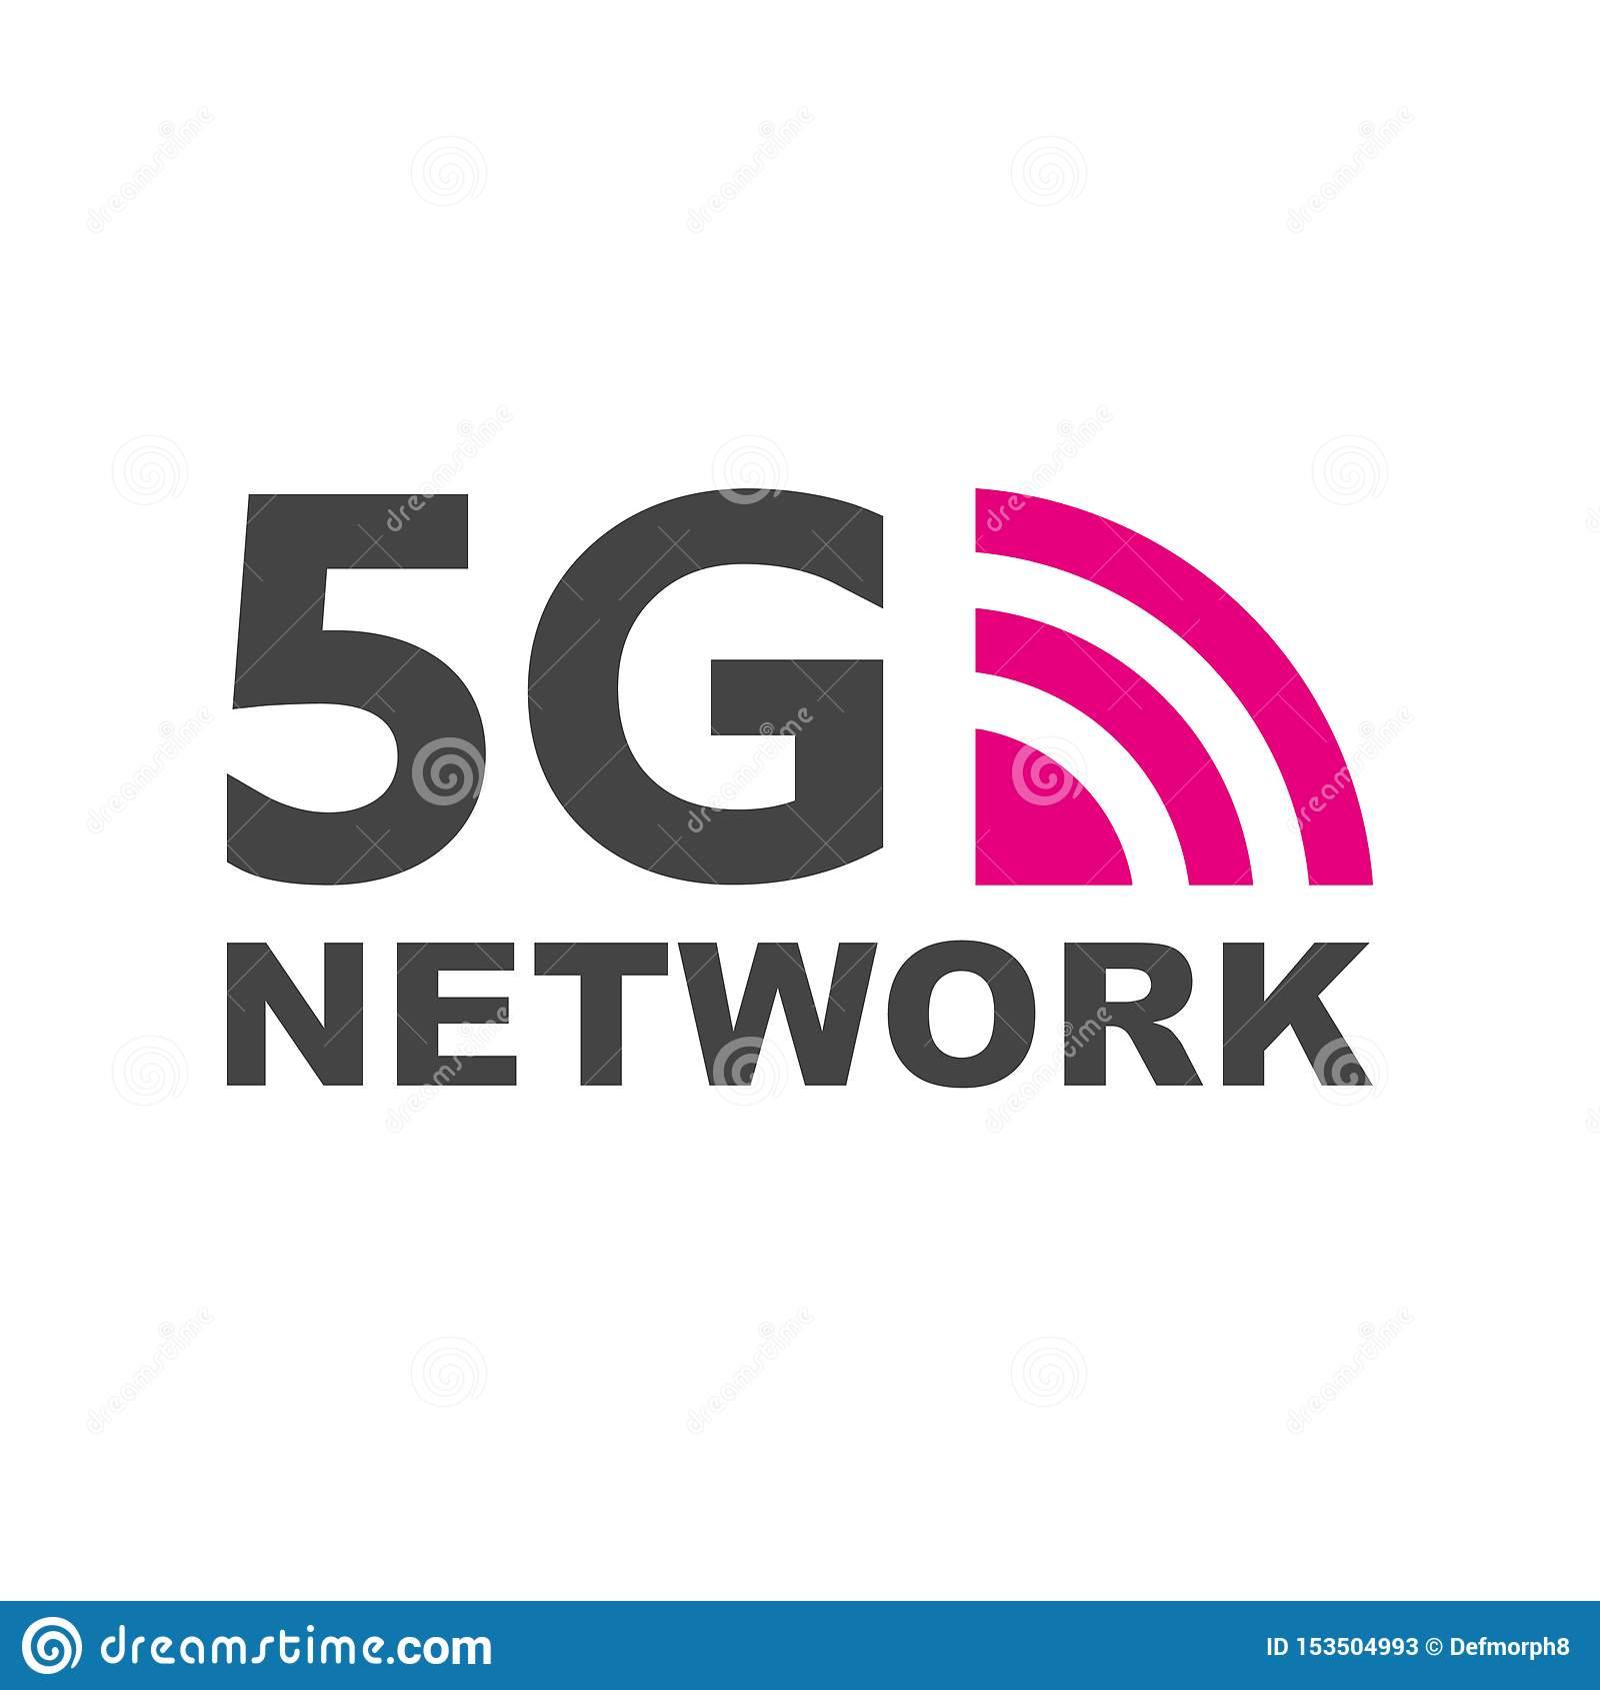 5G νέα ασύρματη σύνδεση wifi Διαδικτύου Διανυσματικό σημάδι 5G δικτύων εικονιδίων τεχνολογίας Πέμπτη καινοτόμος γενεά